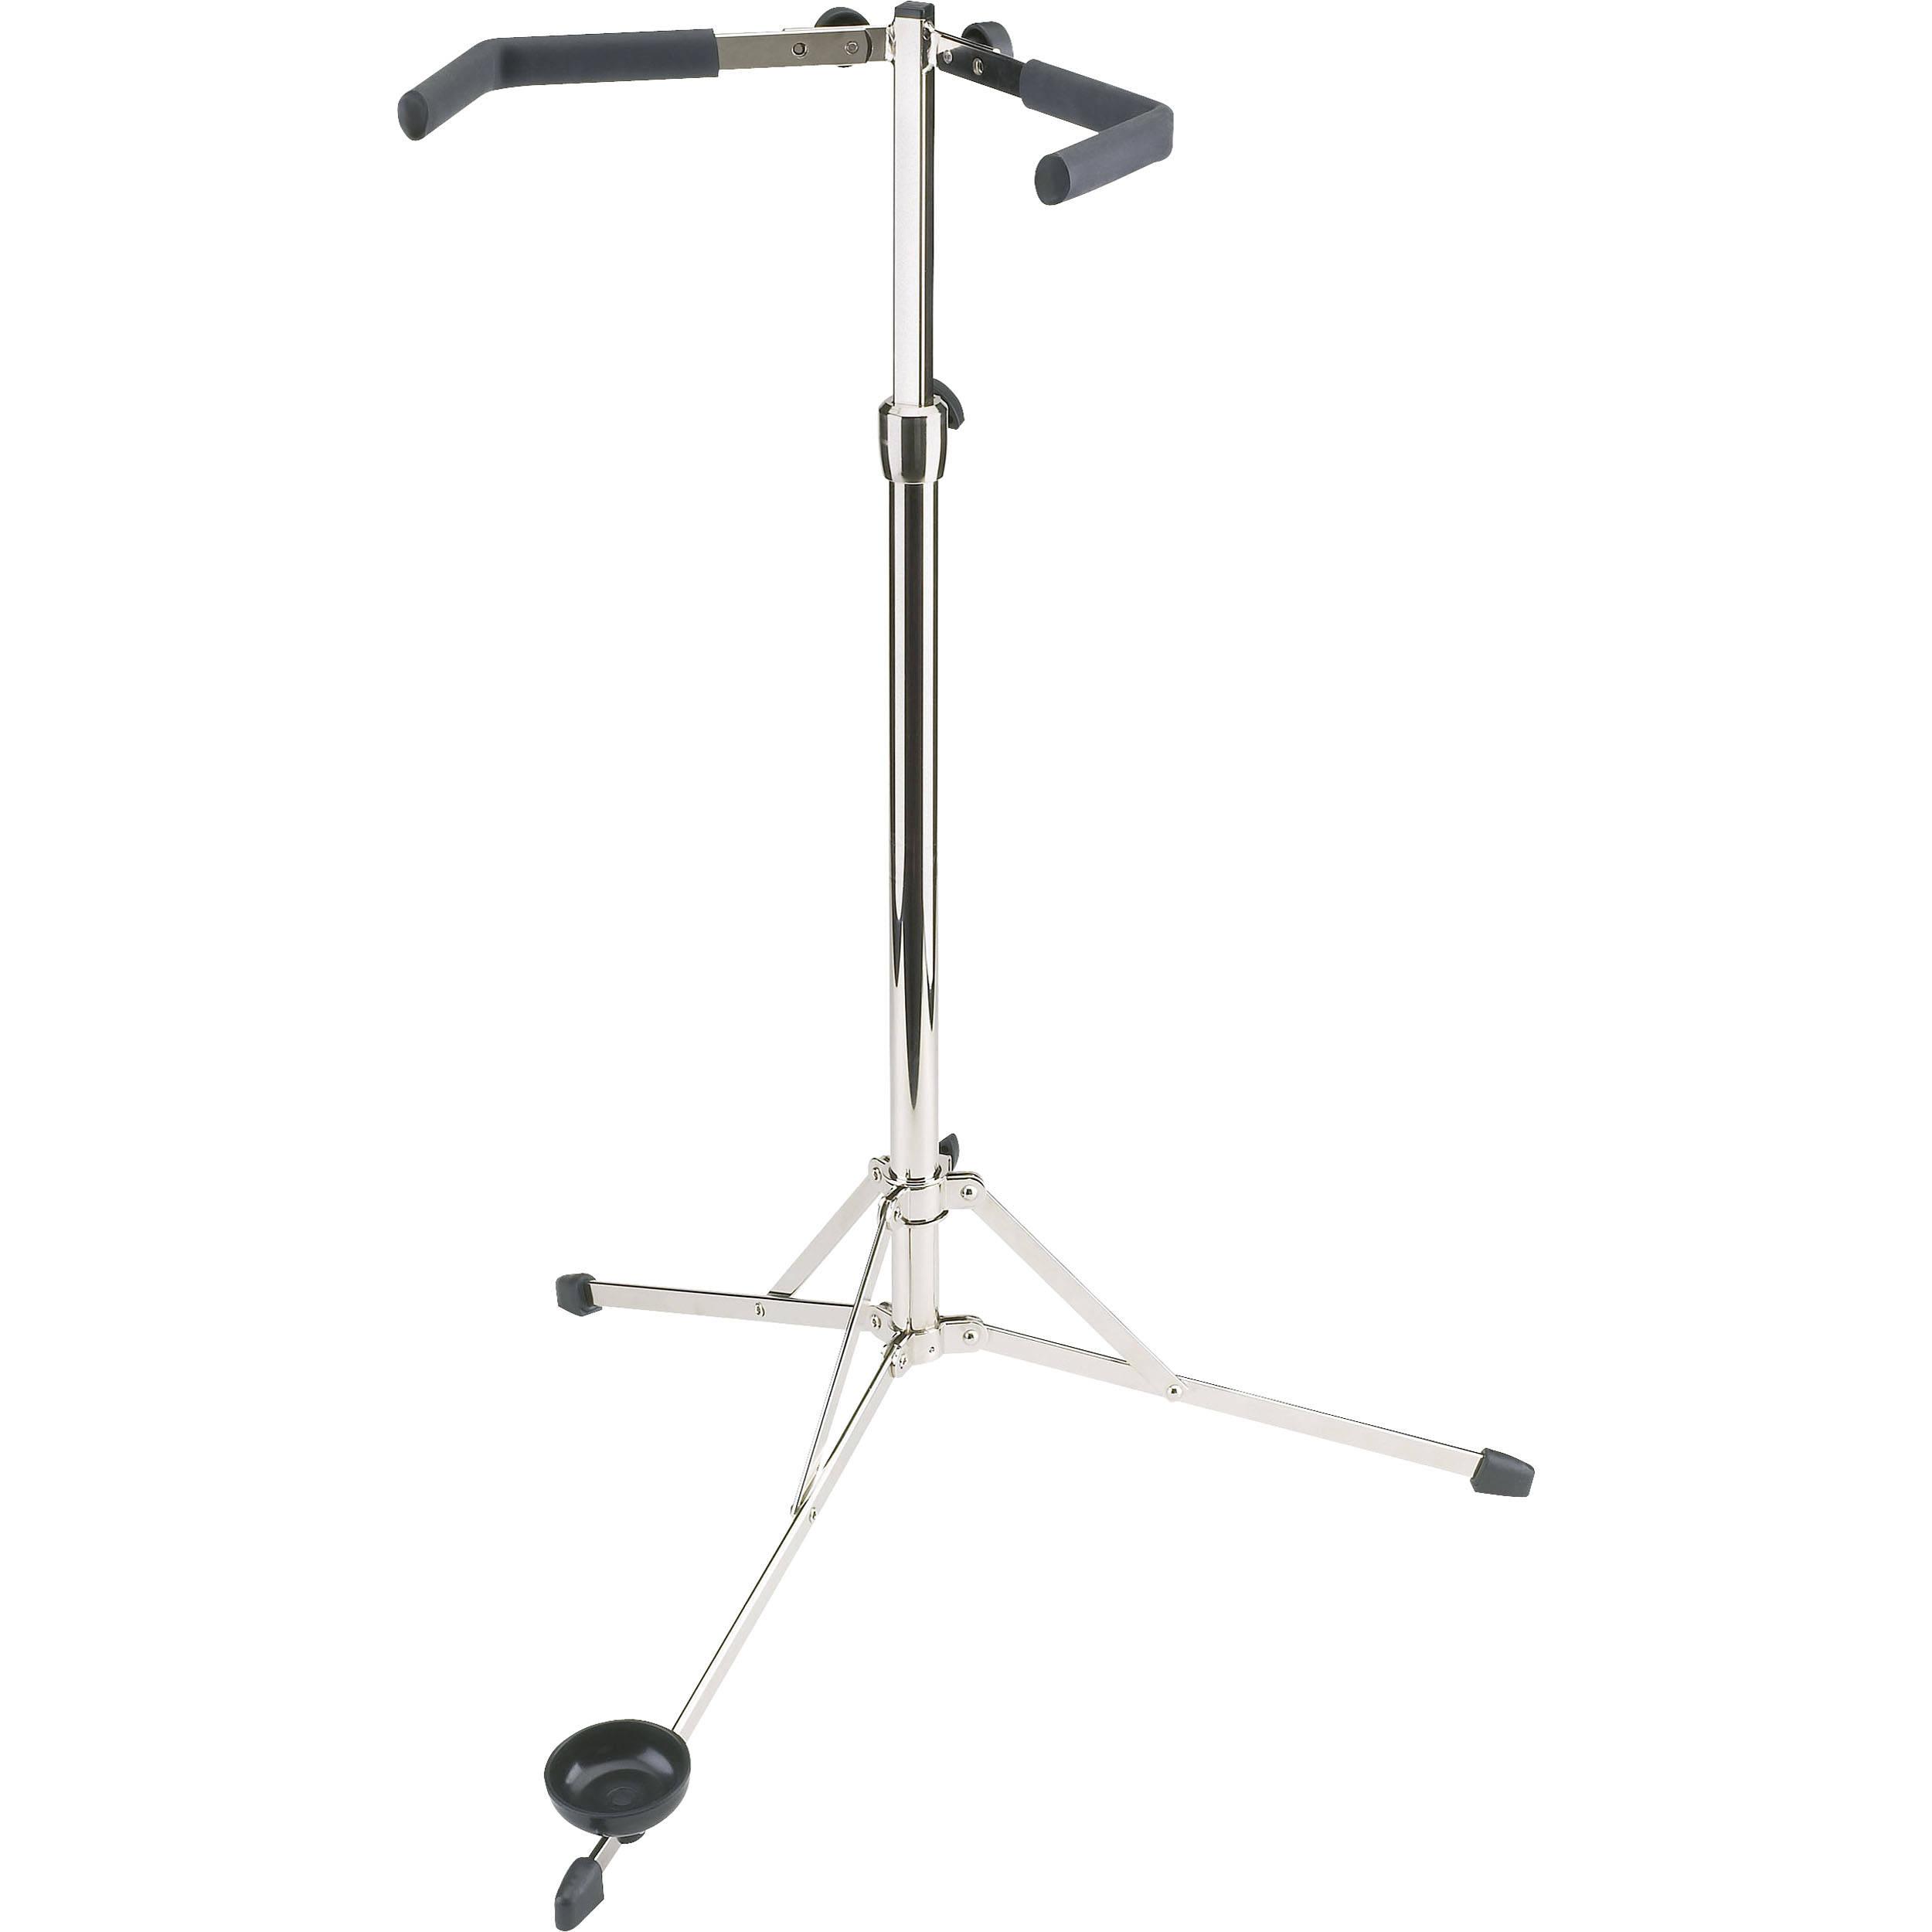 K&M 14100-000-02 141 Bass Stand (Chrome) 14100-000-02 B&H